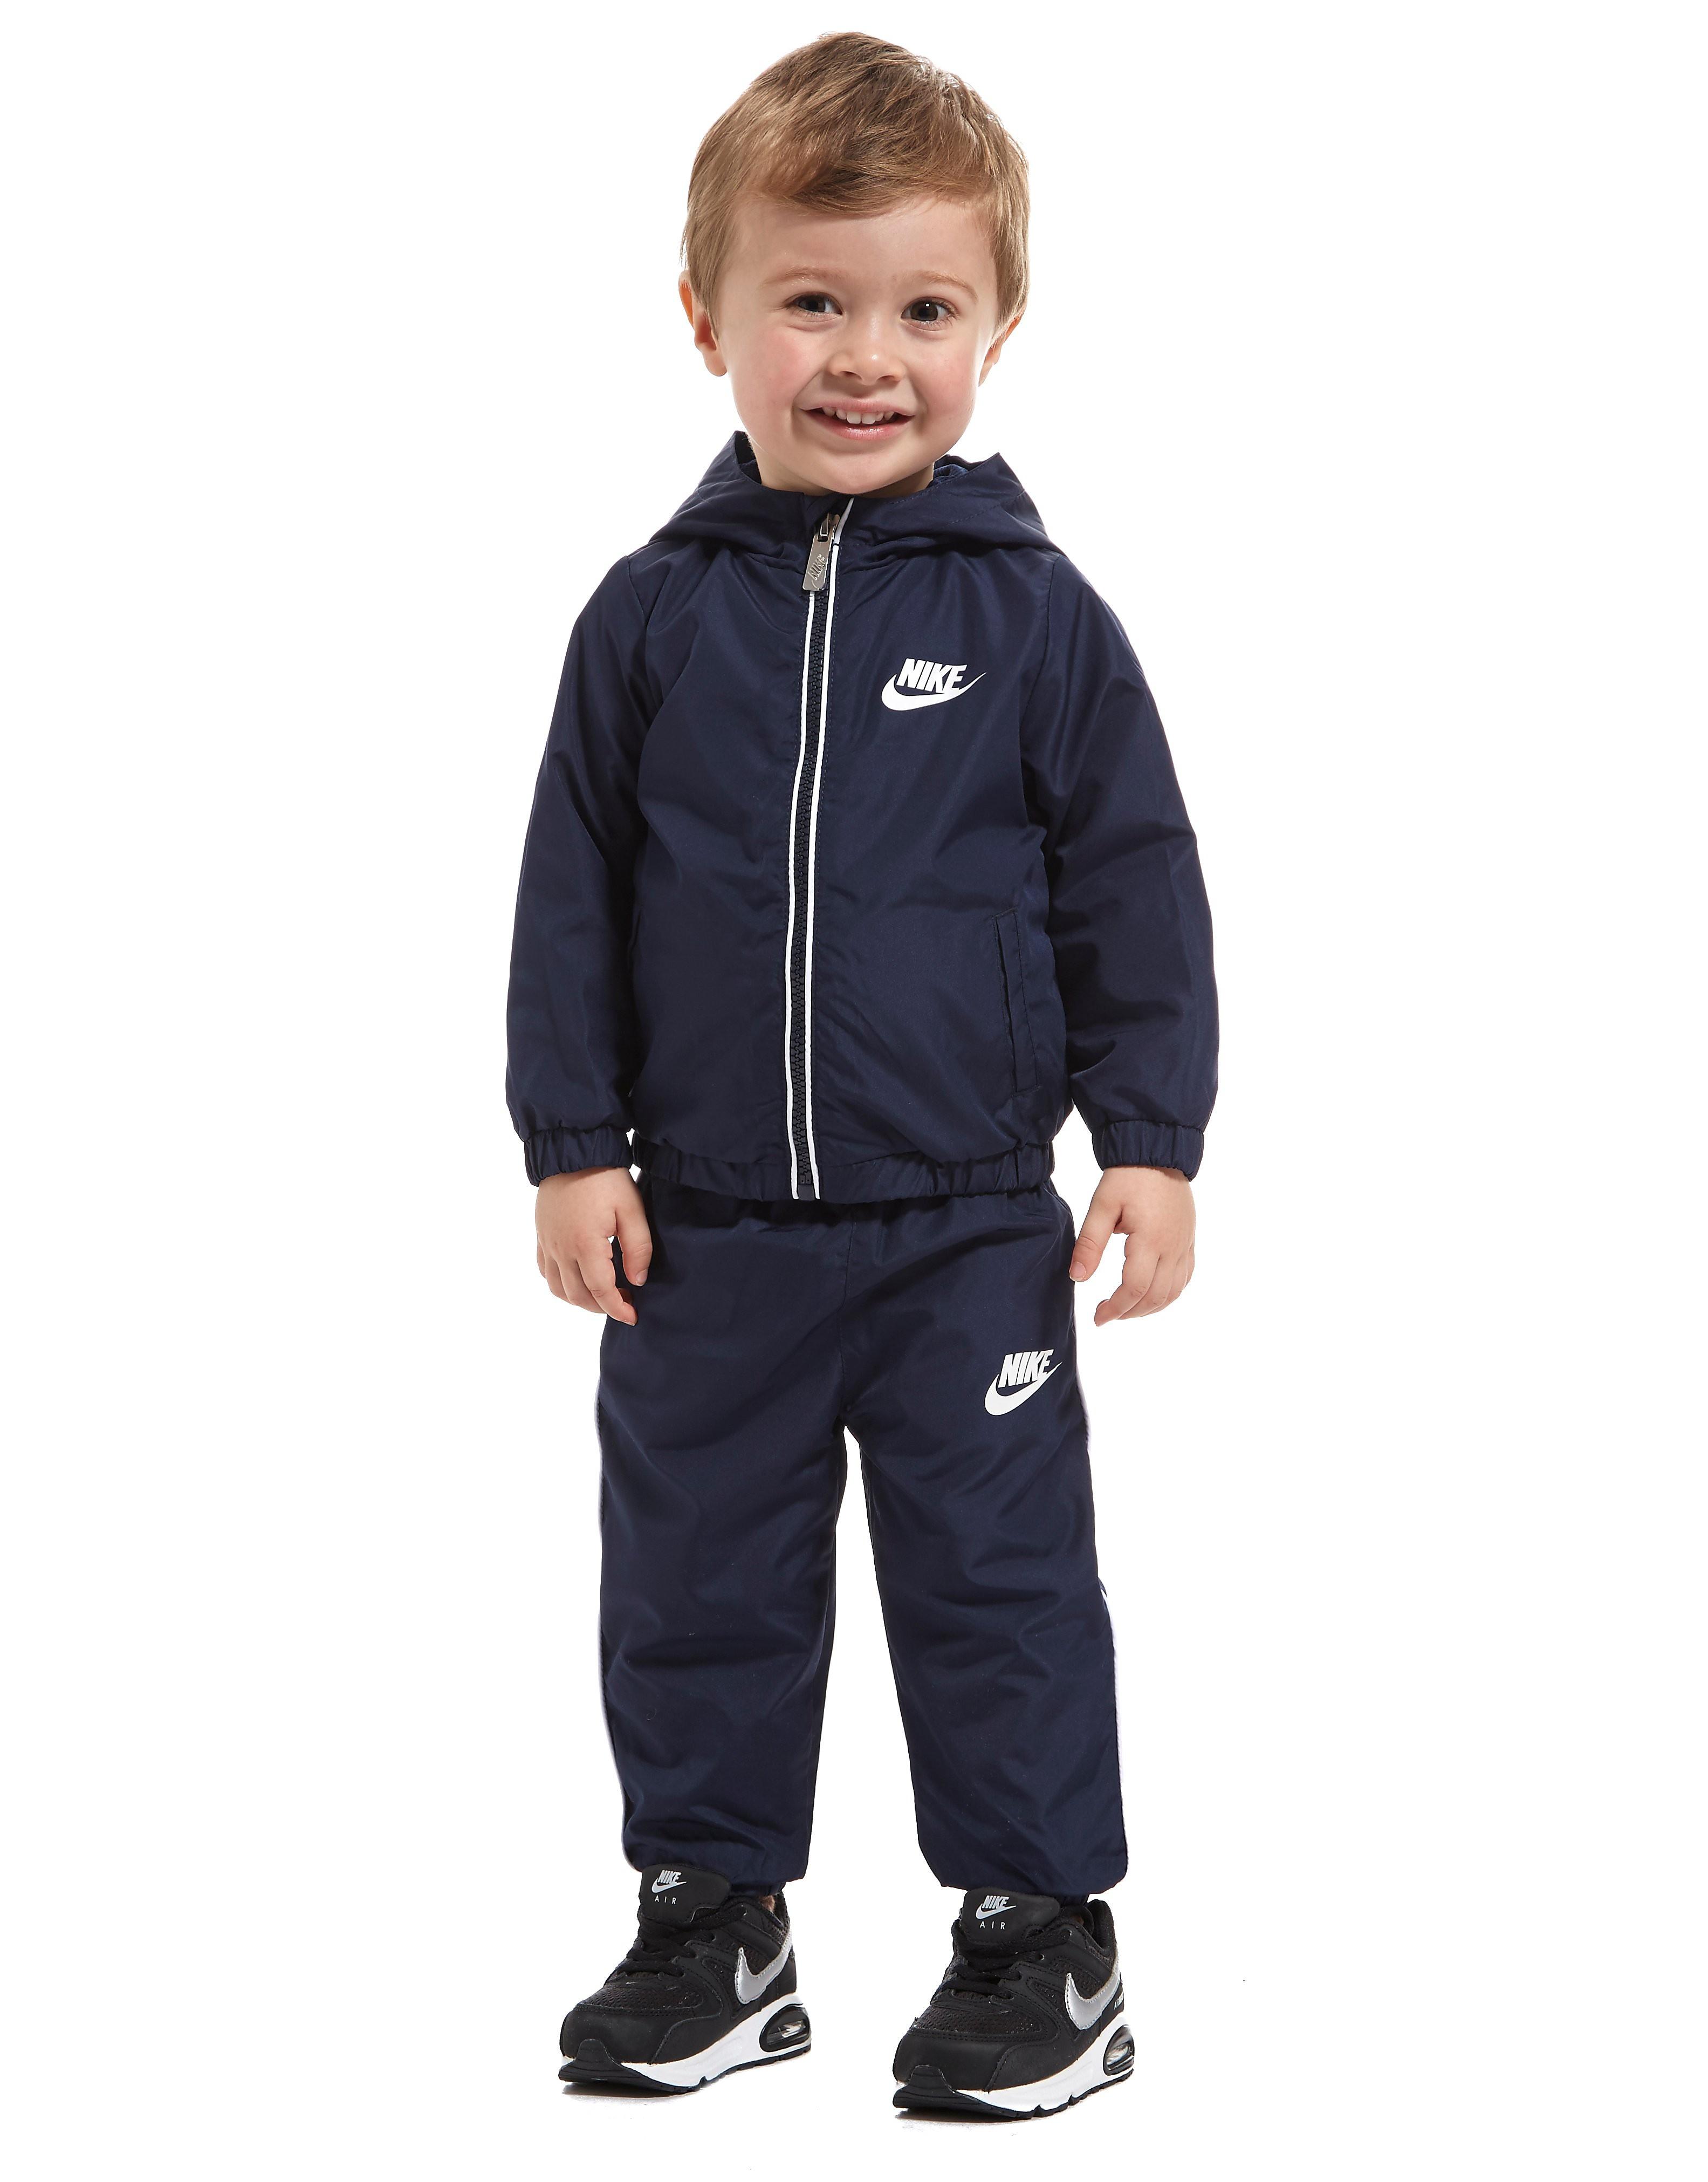 Nike SB Shutout Tuta da Ginnastica Bebè